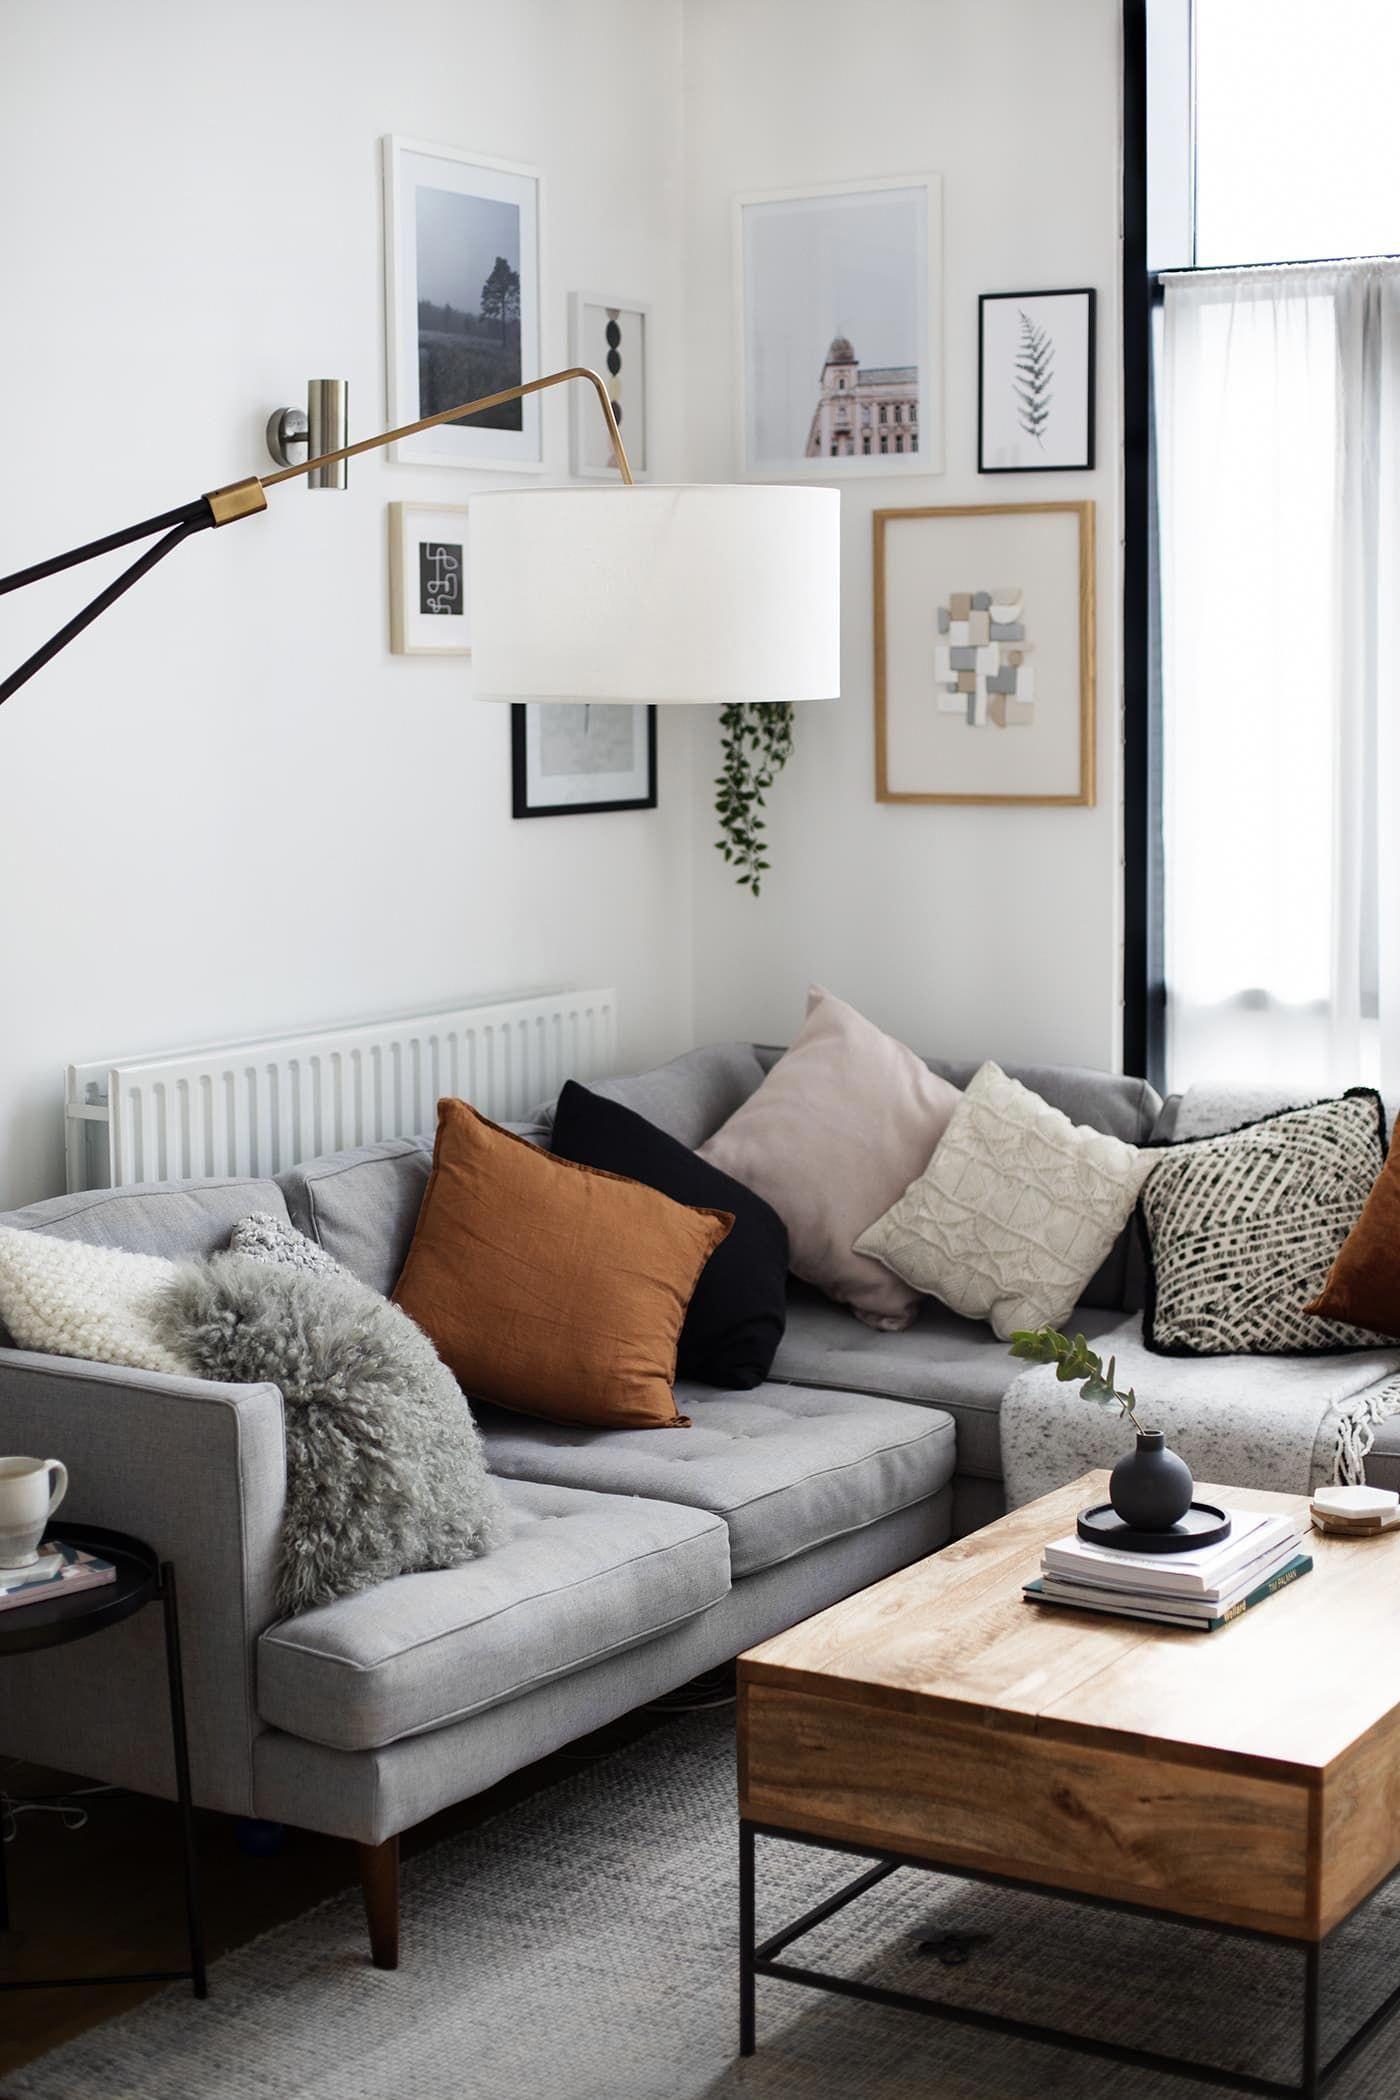 Living Room Decor At Mr Price Home Homedecorlivingroom Home Decor